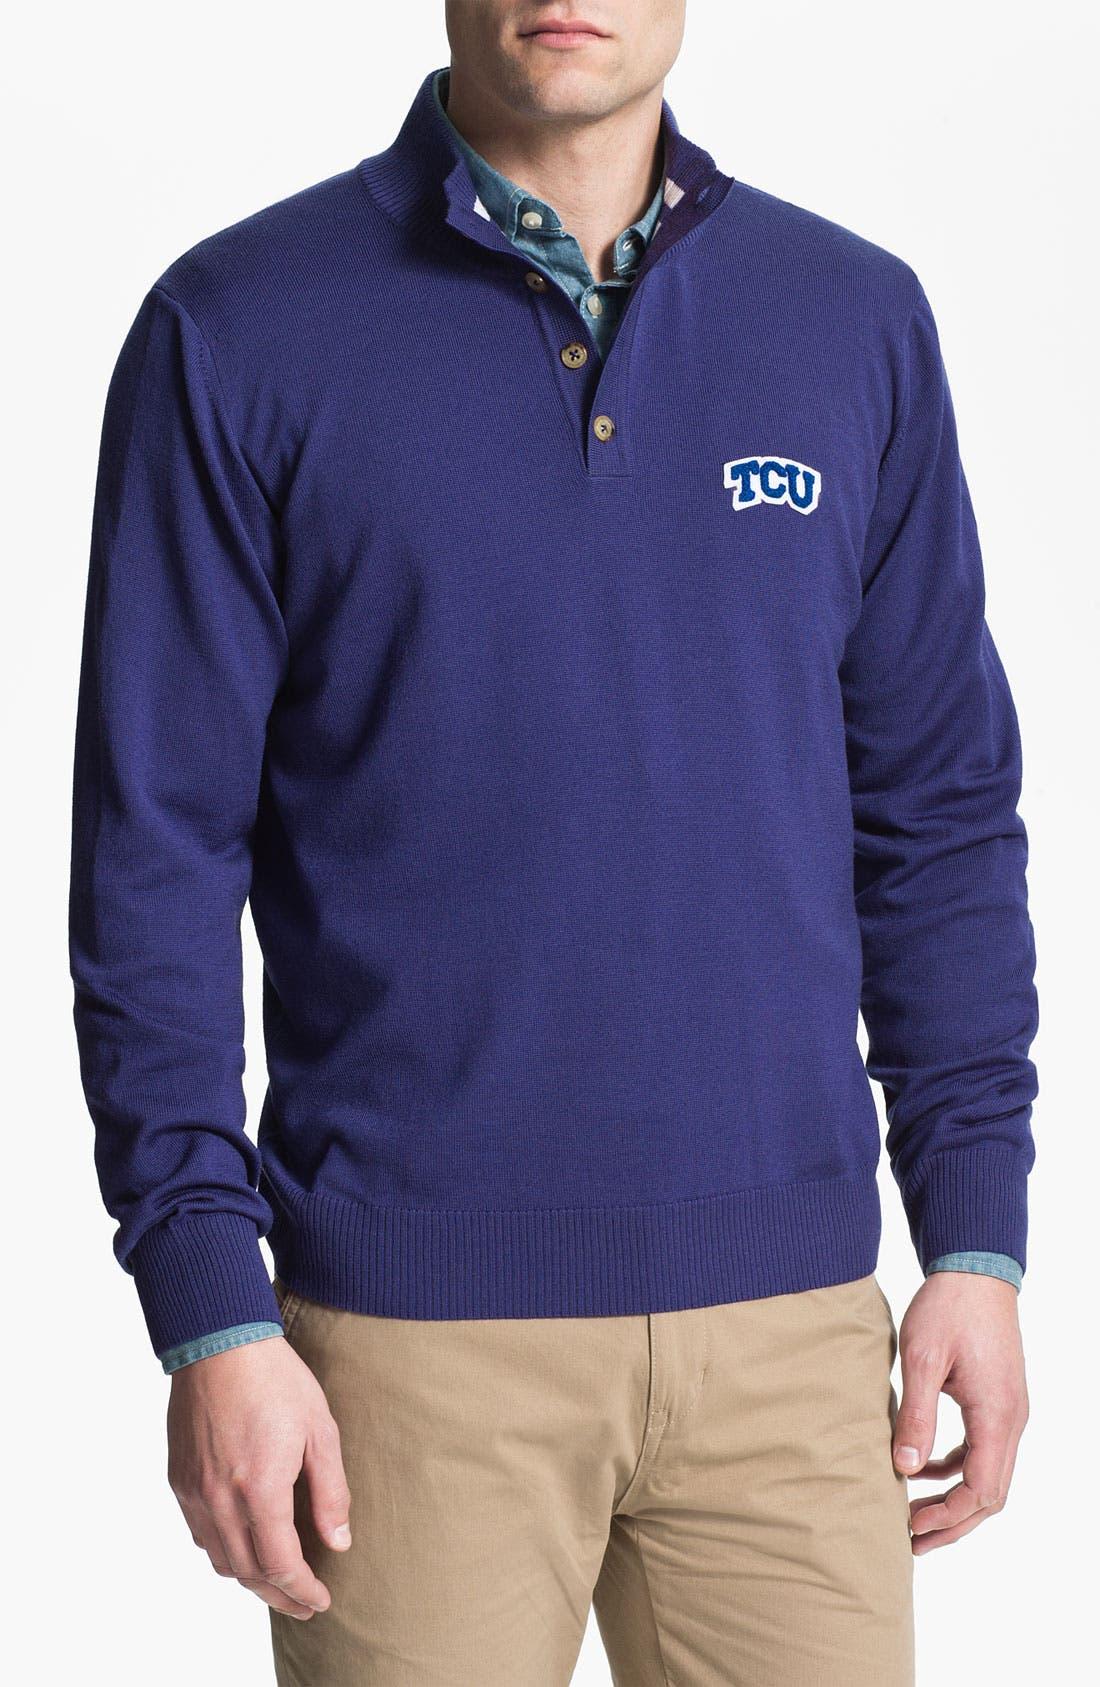 Alternate Image 1 Selected - Thomas Dean 'Texas Christian University' Wool Sweater